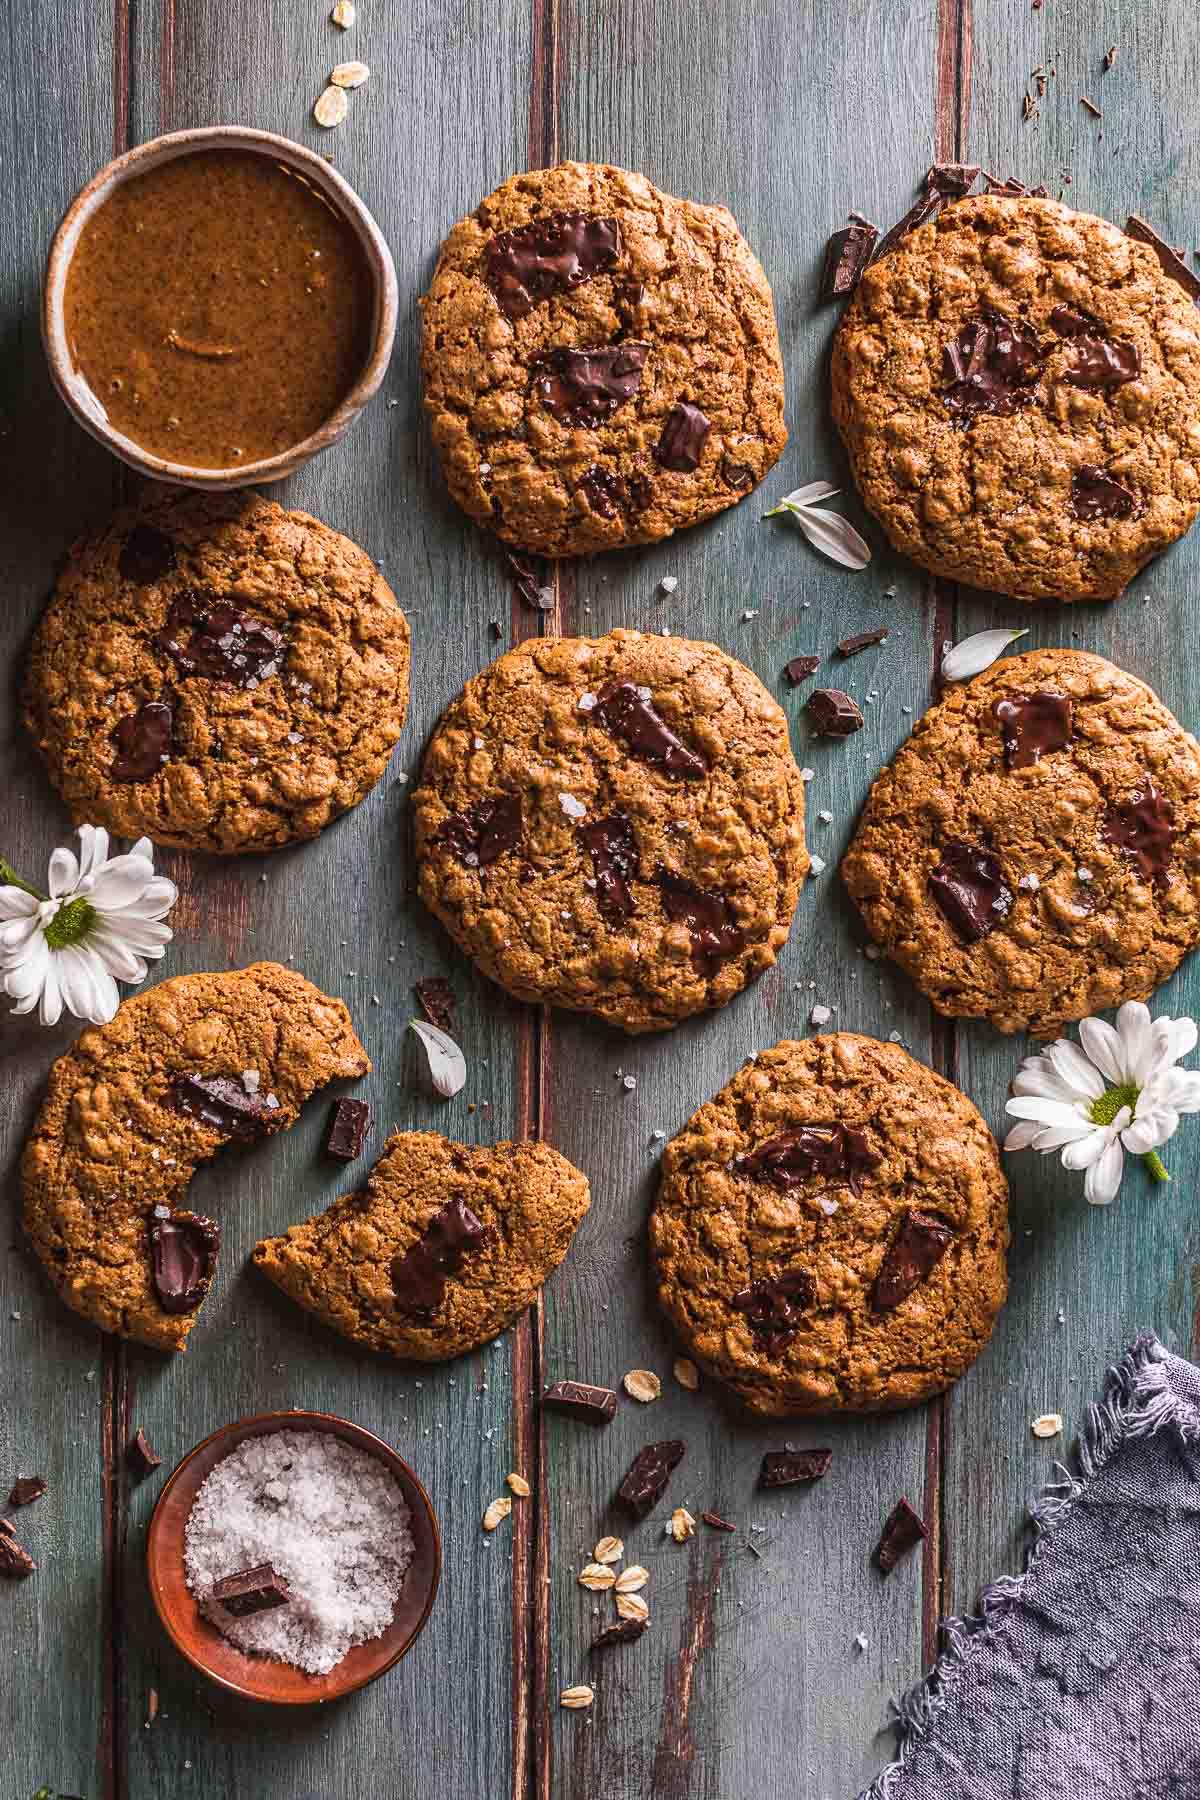 Healthy oil-free almond butter Gluten-free Vegan Oatmeal Chocolate Chip Cookies Cookies vegani senza glutine al cioccolato senza olio al burro di mandorle